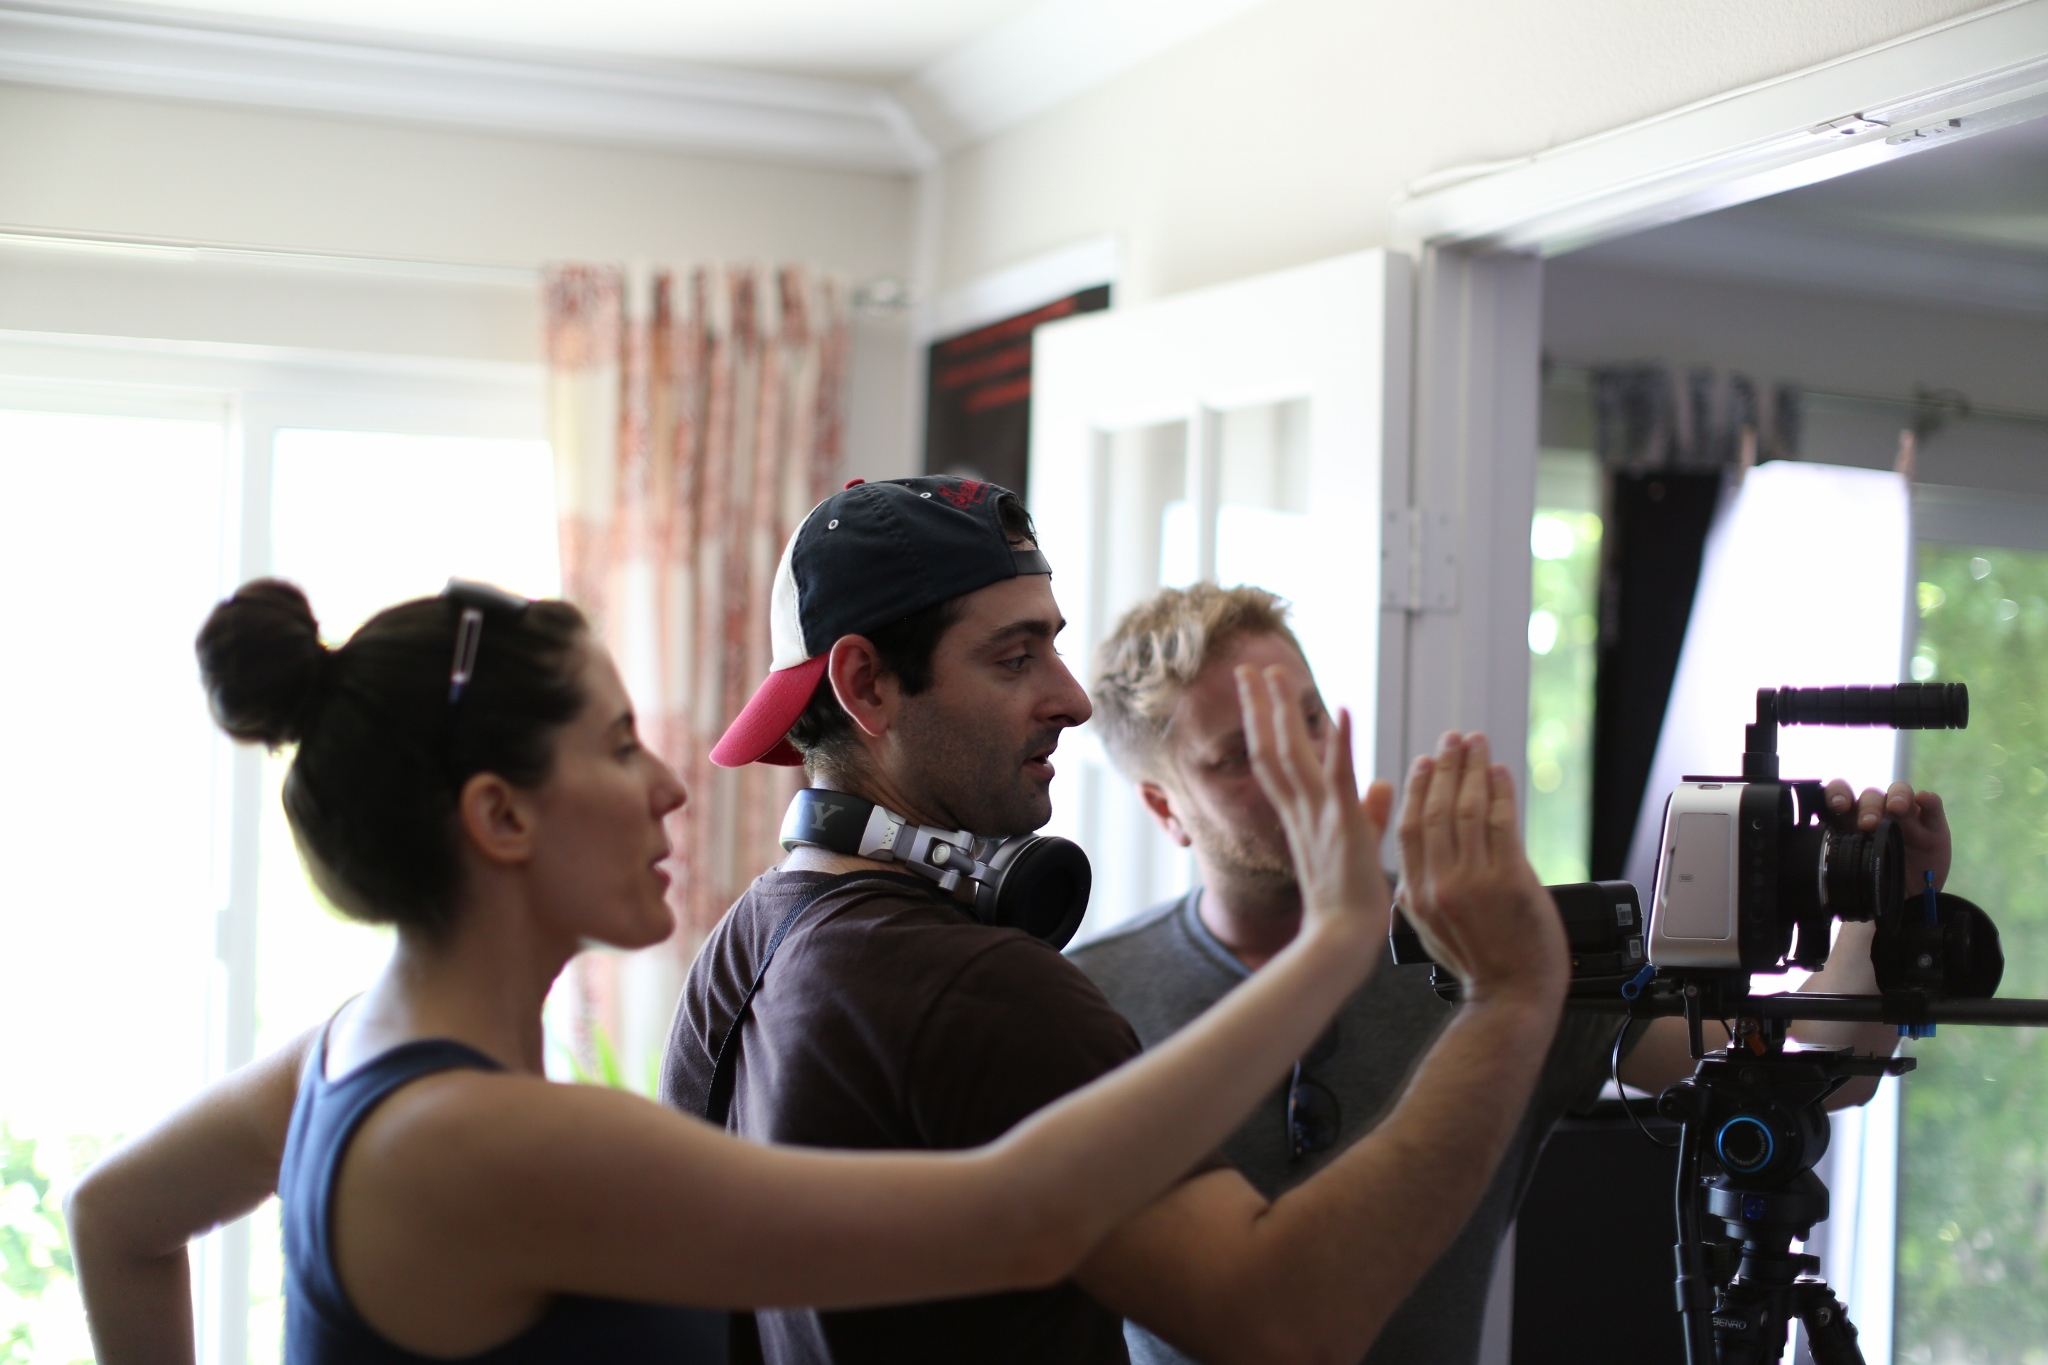 Jessica, Ethan, Sam discuss the shot